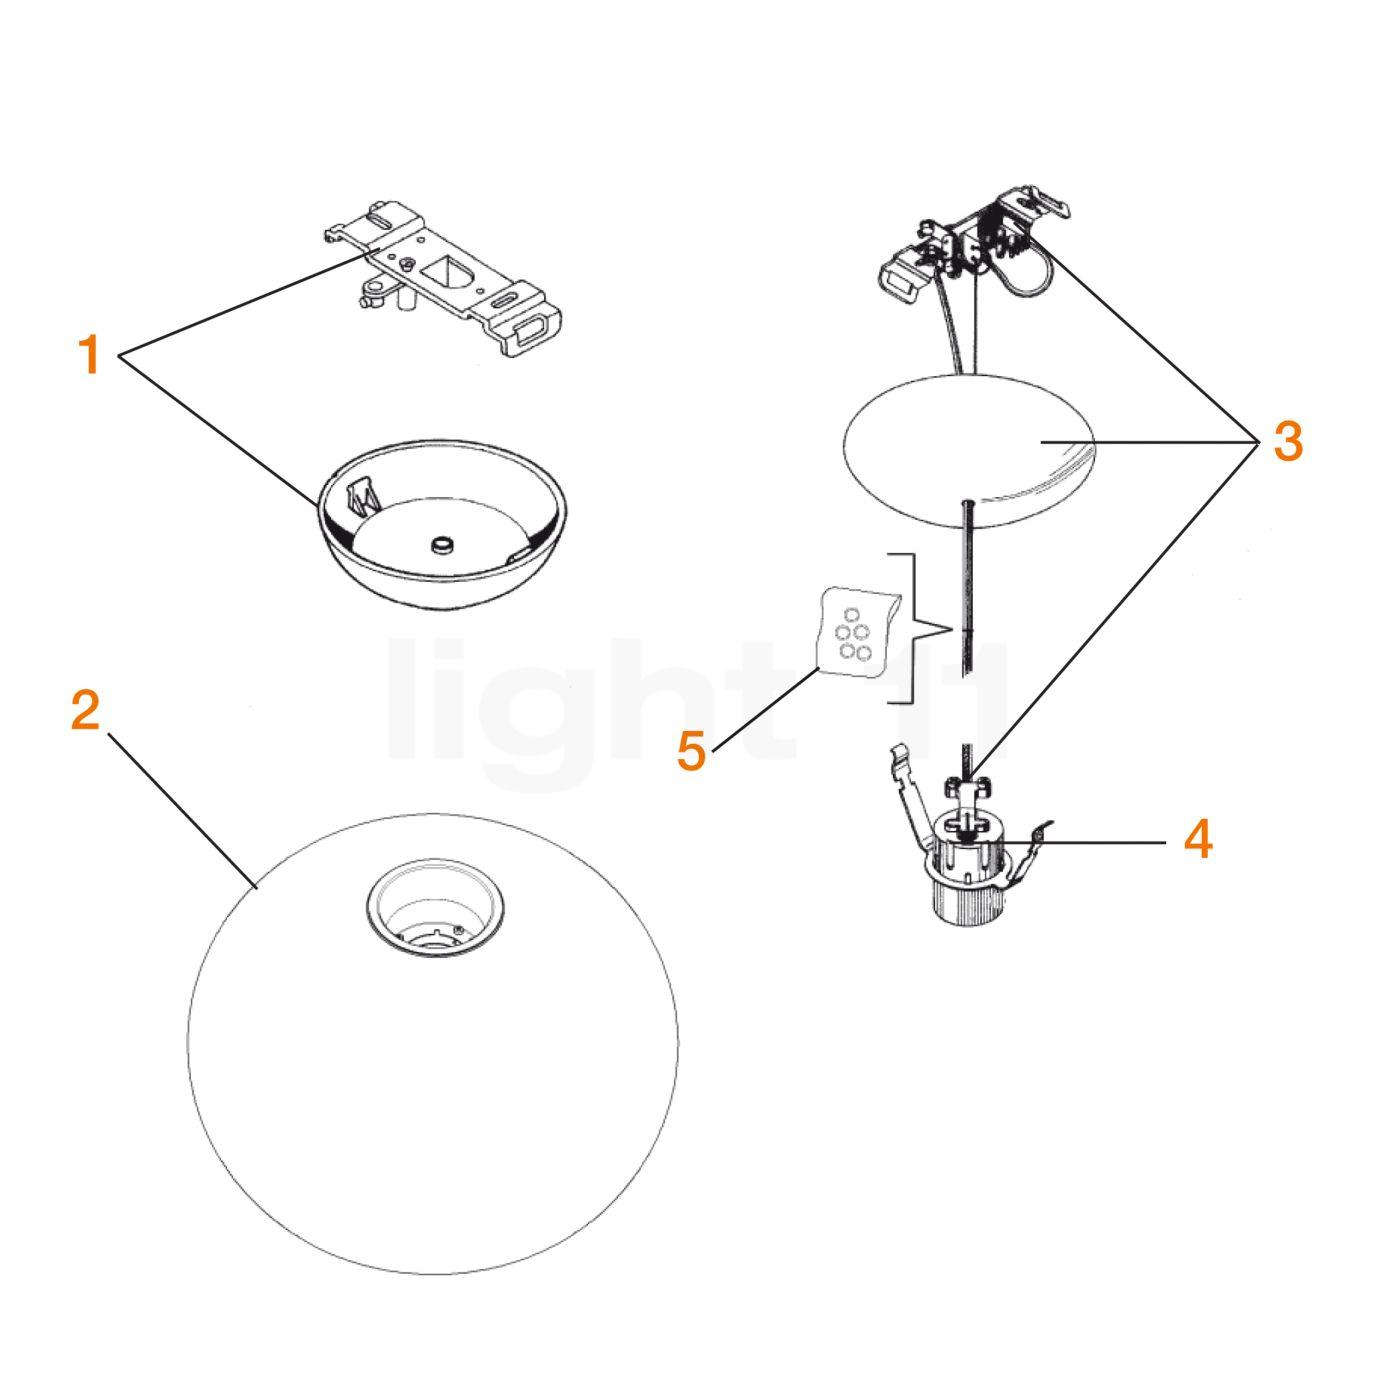 Flos_Spare_parts_for_Glo_Ball_S1--51a8caa574d534397de984ca7b030263 Elegantes Flos Glo Ball S Dekorationen